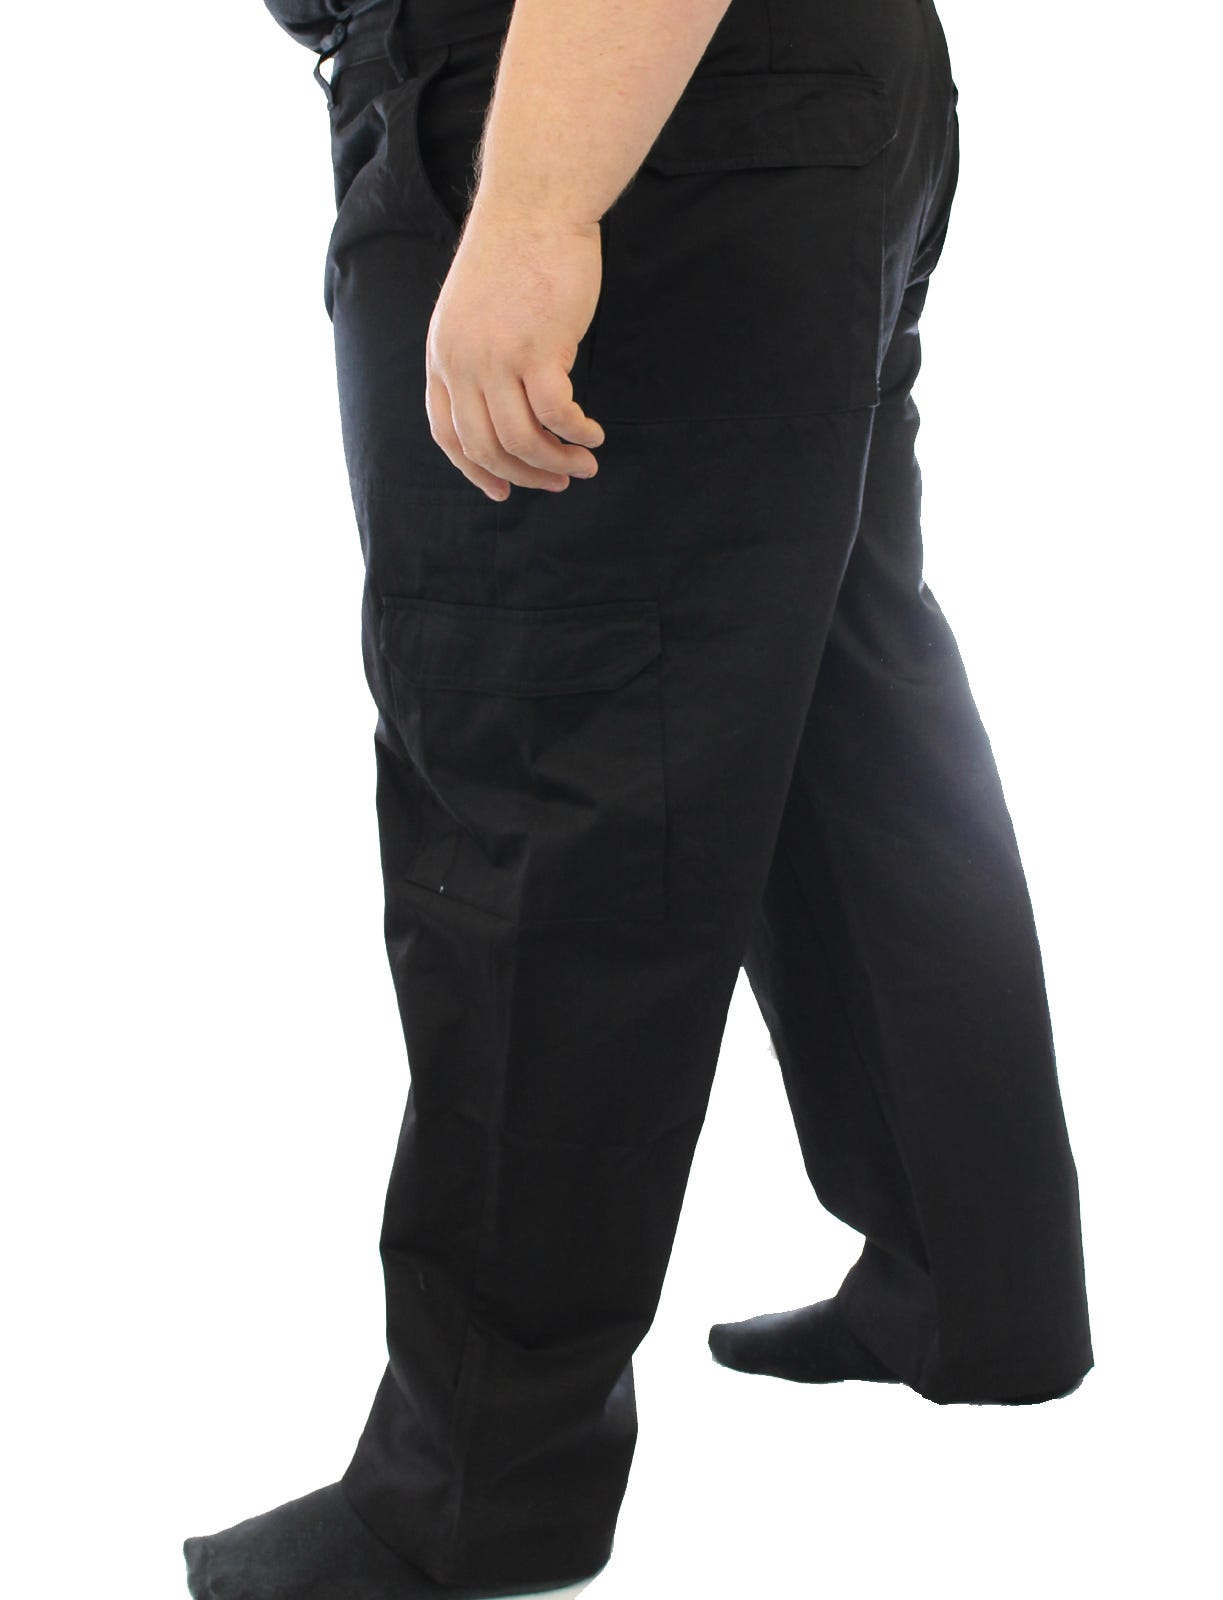 "Ed Baxter Victory - Heavy Duty Cargo Combat Trousers - Black - 62"" Waist, 30"" Leg"